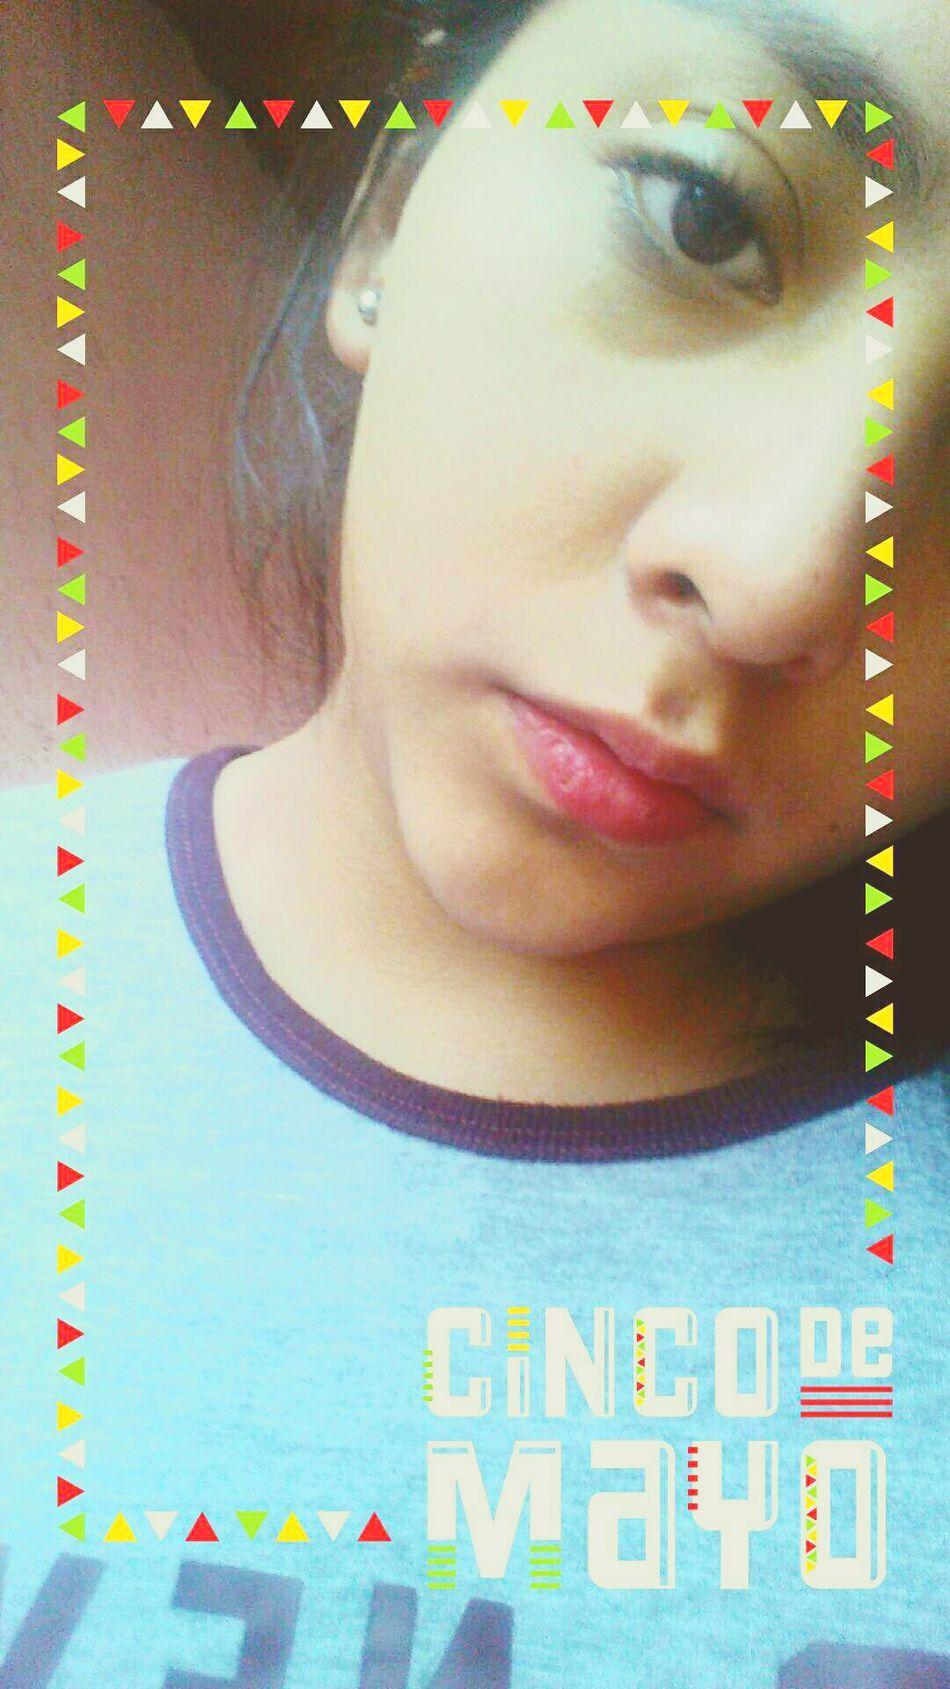 Picoftheday Pictureoftheday Friends ❤ Heart Life Followme Love May 5demayo Snapshots Of Life Girl